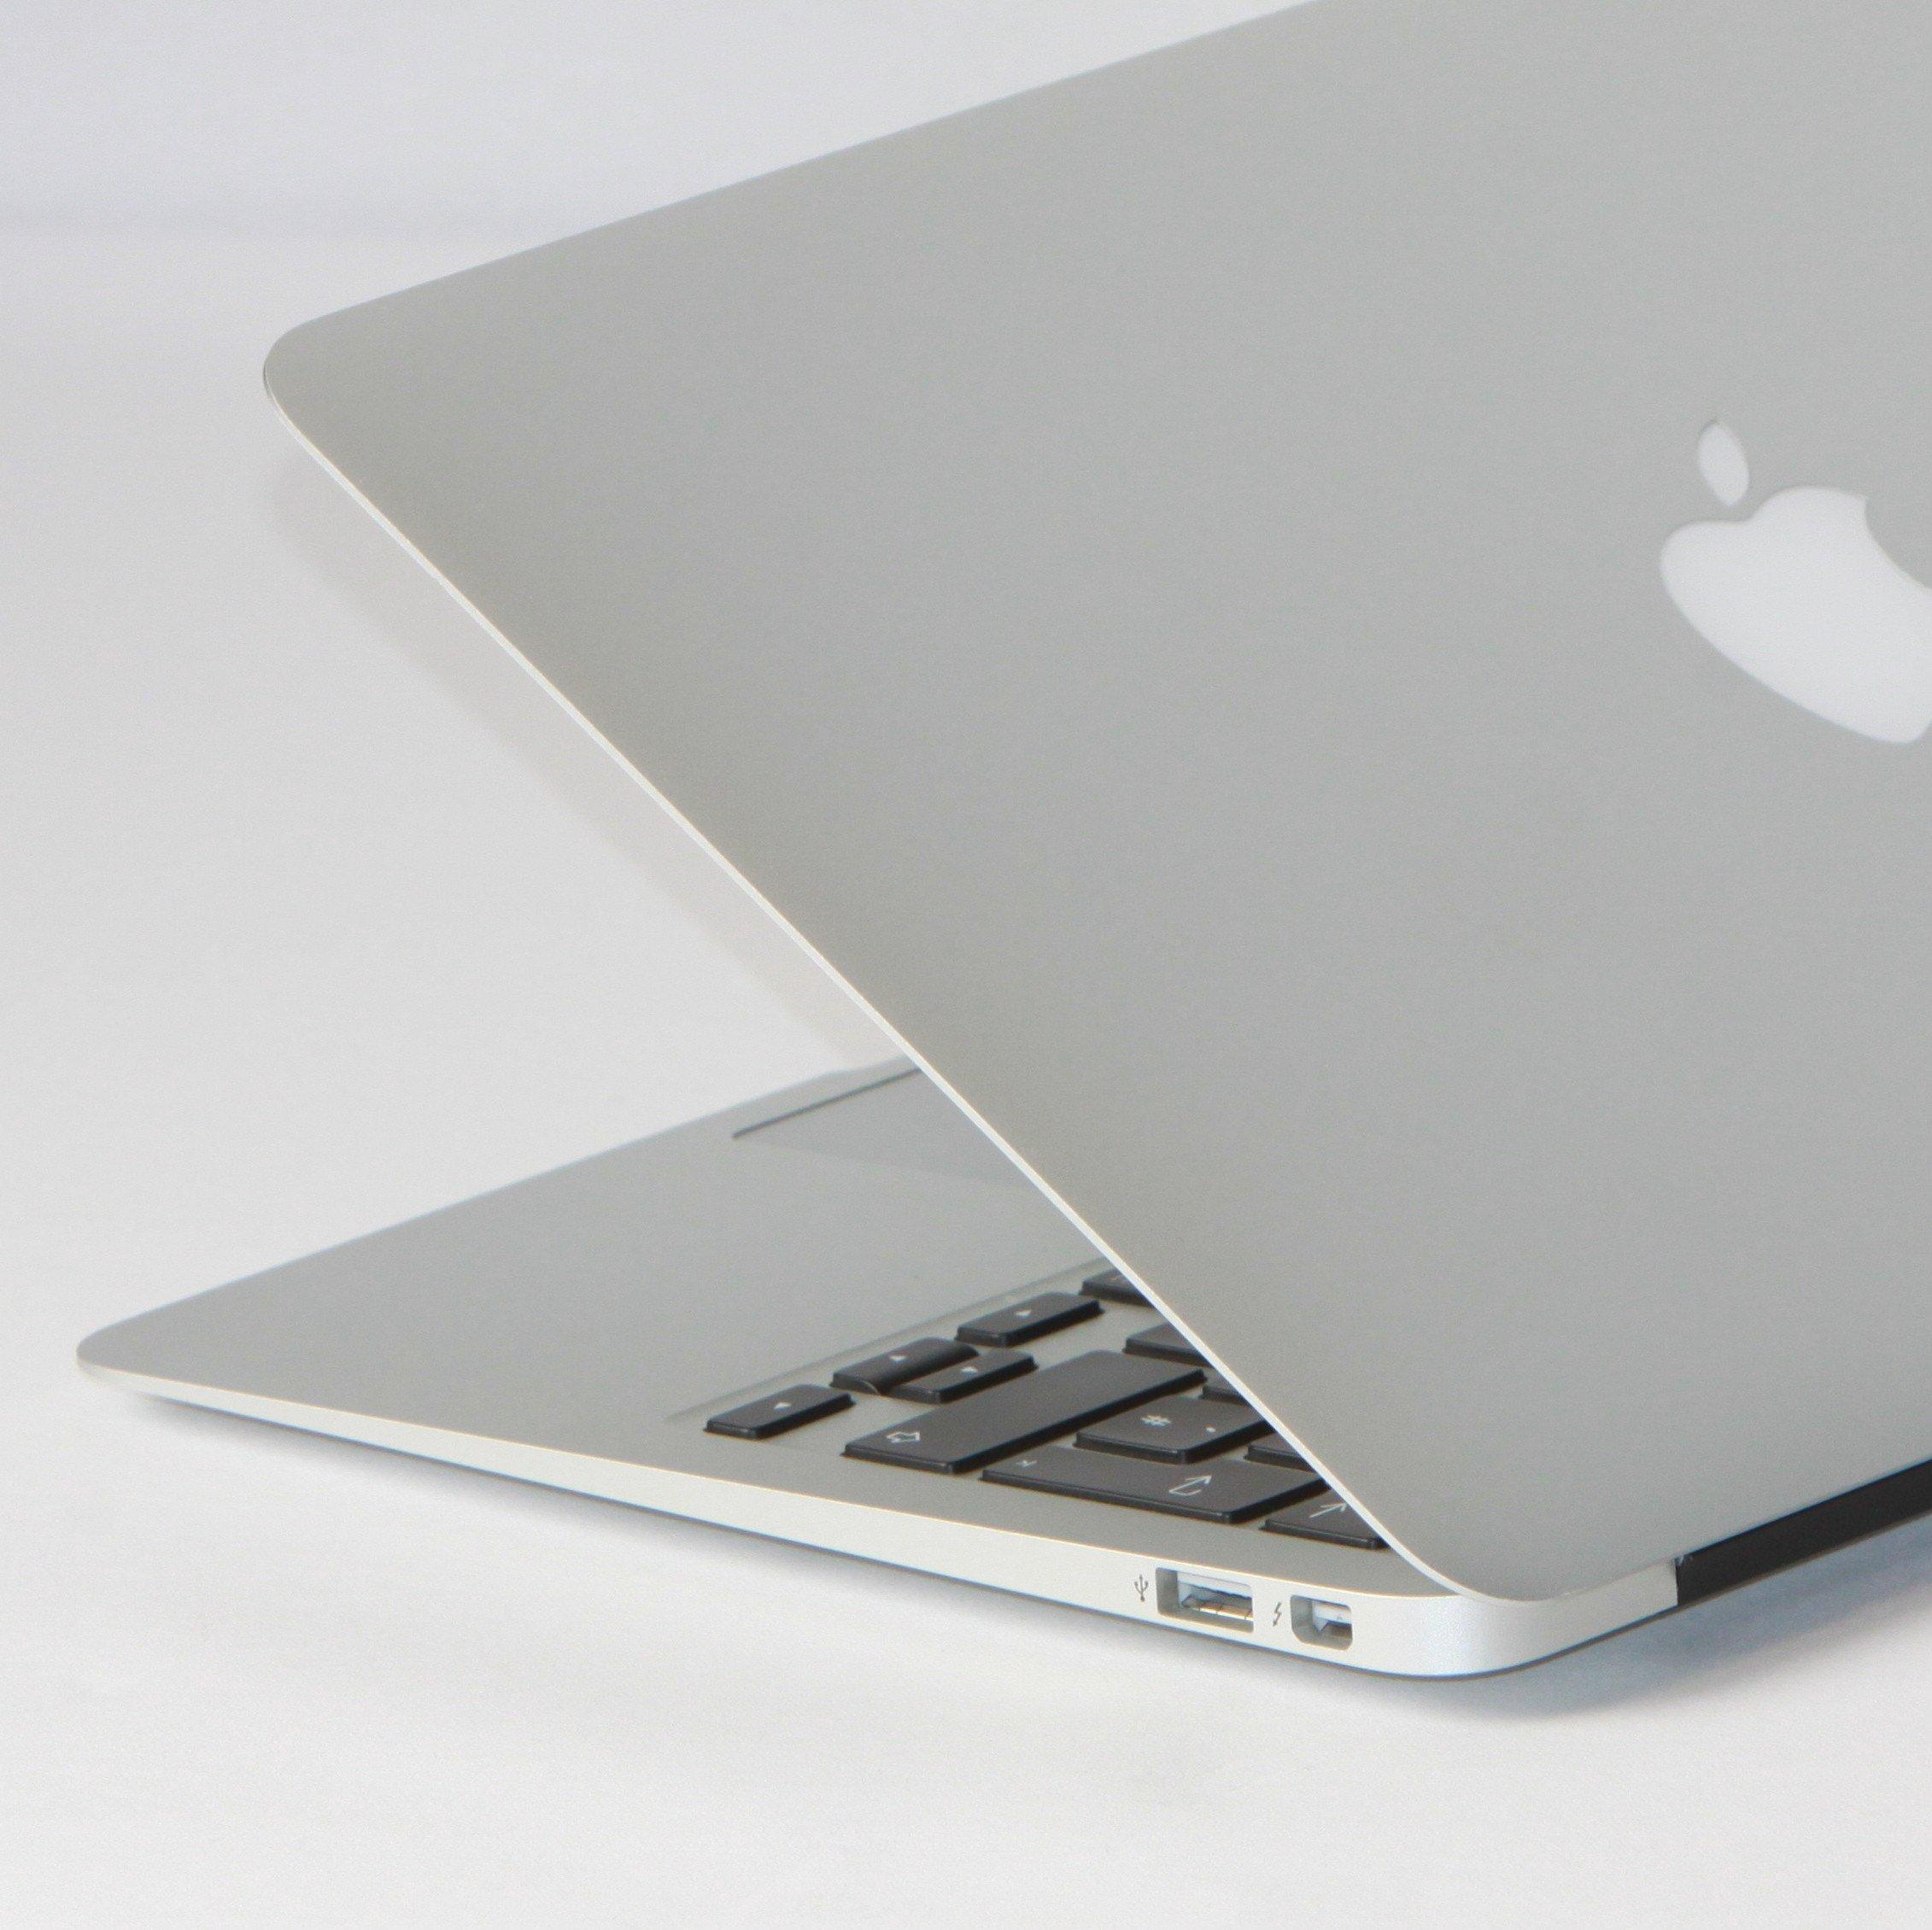 apple macbook air a1465 md711da side sadaghian it speicherlosungen und apple mac reparaturen. Black Bedroom Furniture Sets. Home Design Ideas